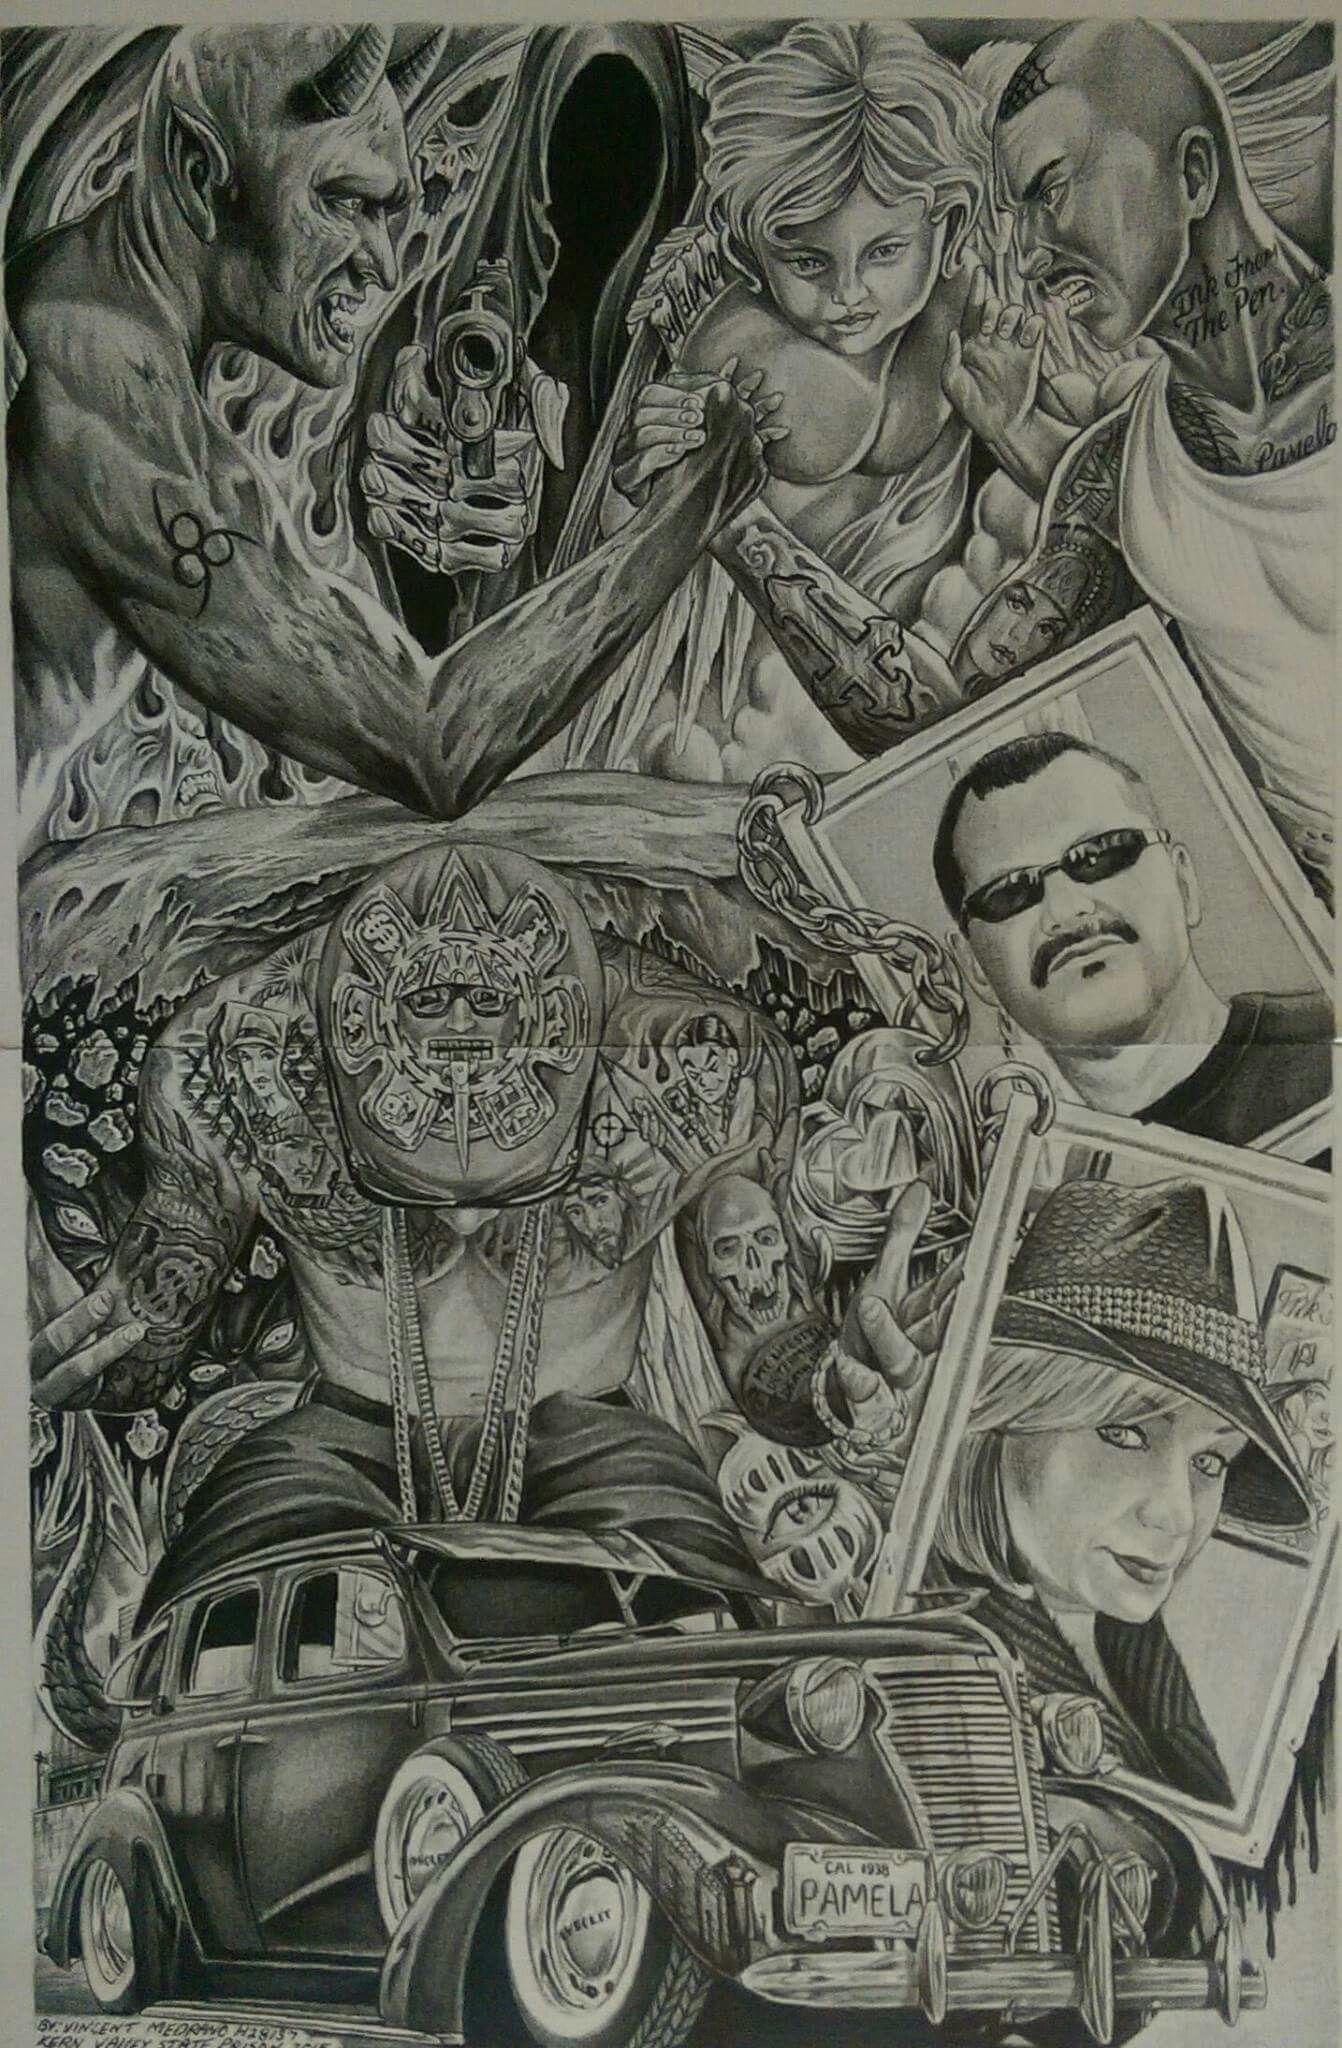 Res: 1342x2048, Prison Art, Chicano Art, Beautiful Drawings, Awesome Tattoos, Lo... -  Res: 1342×2048, Prison Art, Chicano Art, Beautiful Drawings, Awesome Tattoos, Lowrider, Tattoo Ide - #1342x2048 #amazingtattoos #Art #Awesome #BEAUTIFUL #Chicano #cutetattoos #Drawings #gorgeoustattoos #Prison #res #shewolftattoo #tattoos #tattoosforchildren